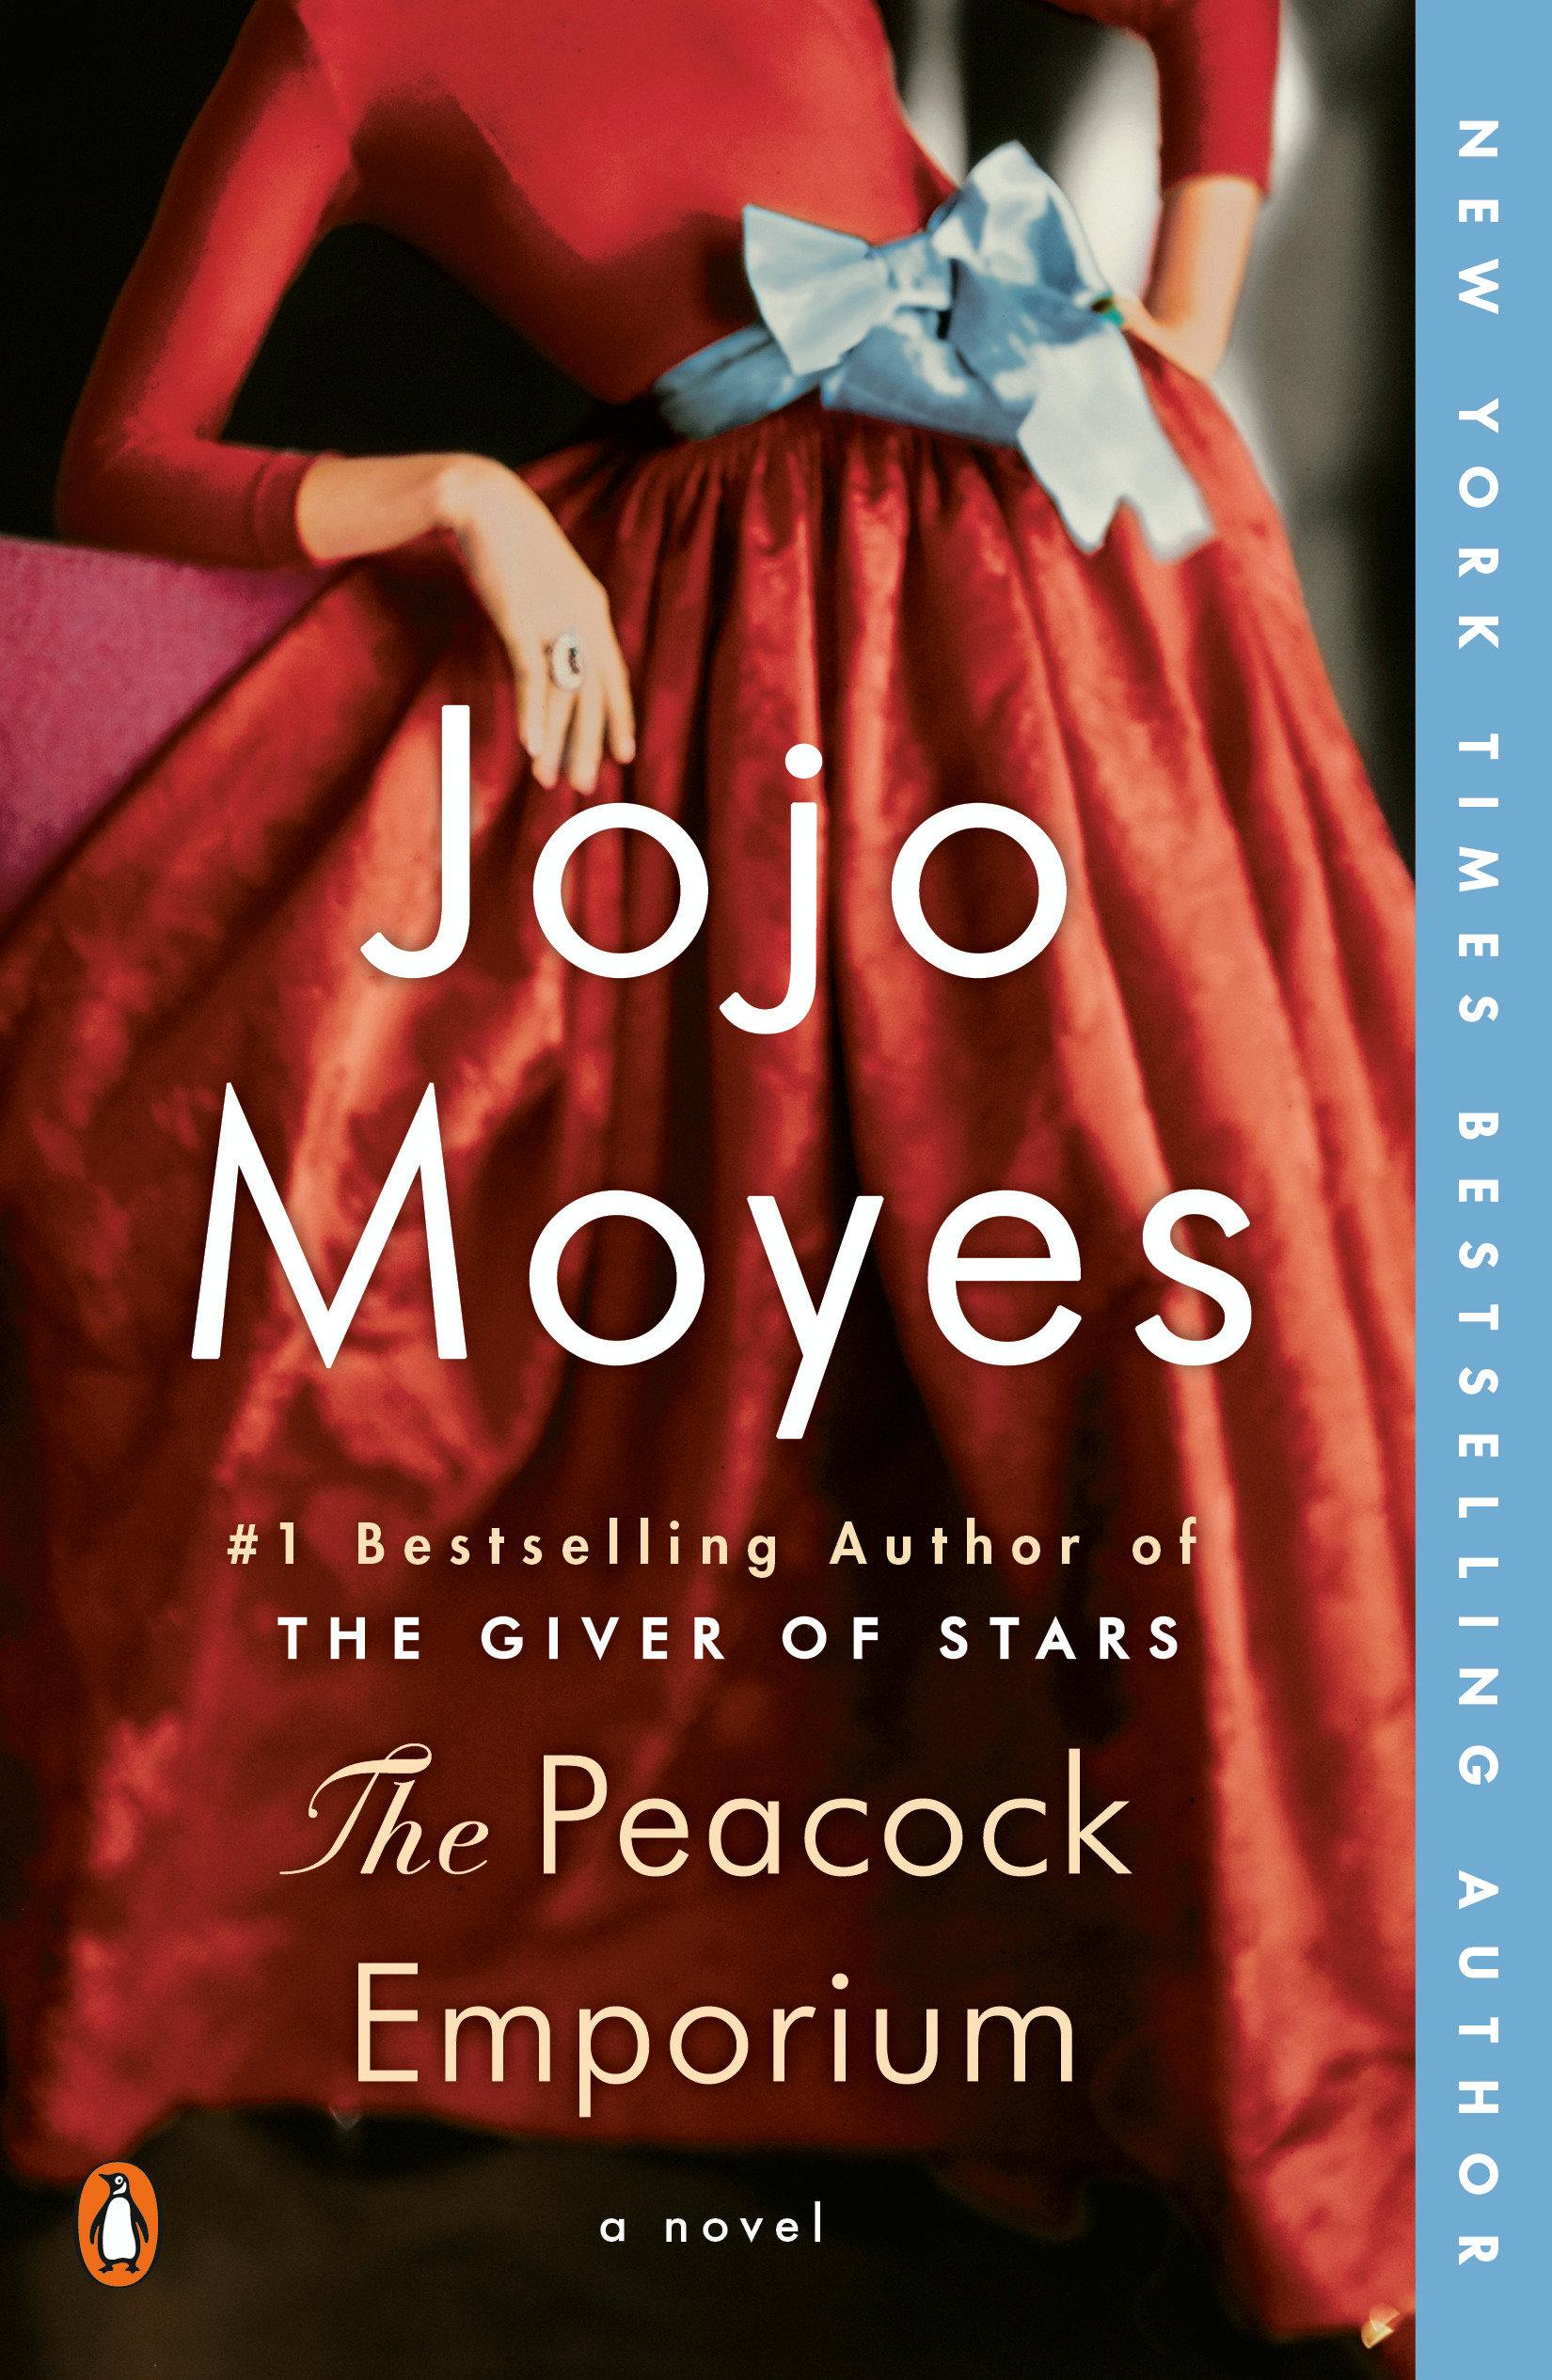 The Peacock Emporium A Novel